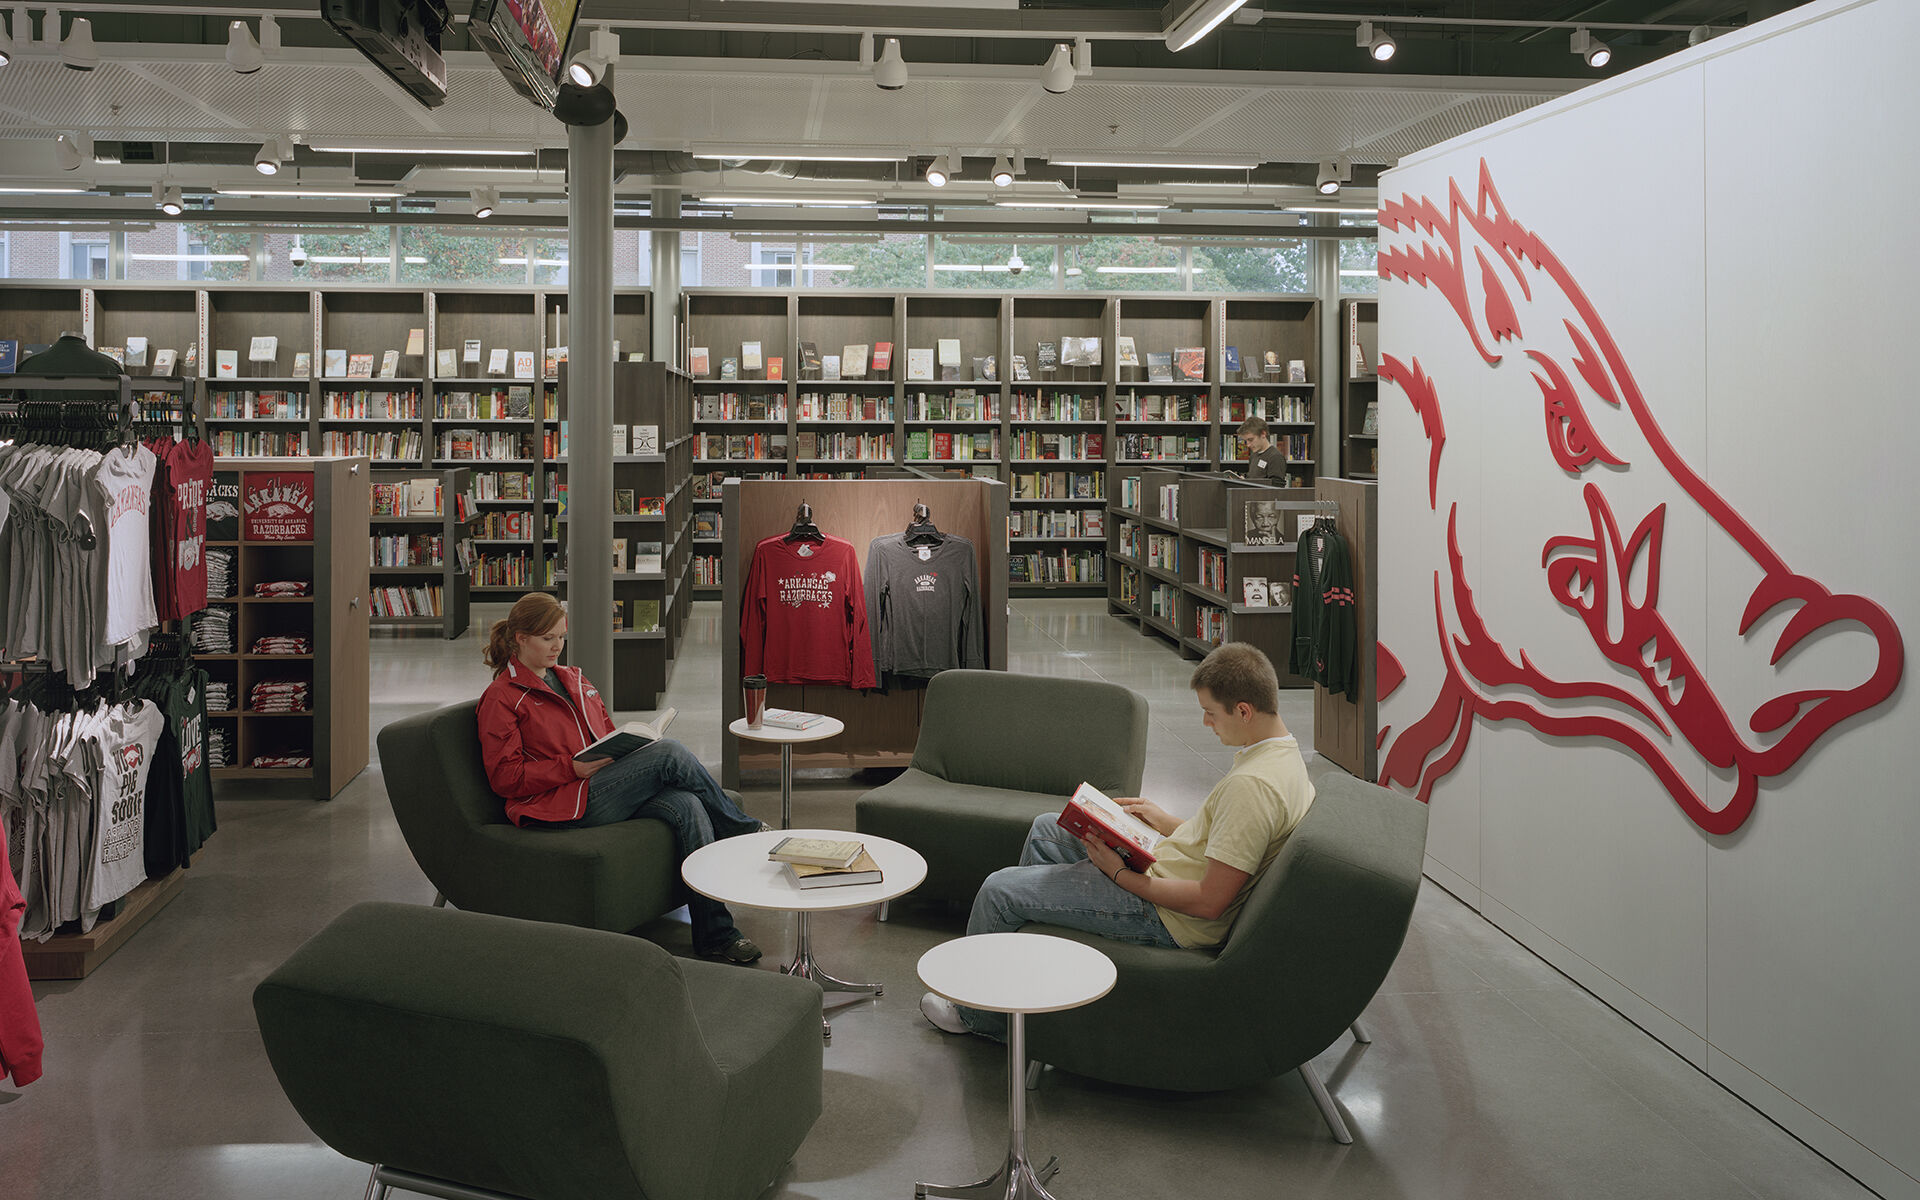 Garland Center Bookstore & Parking Garage - University of Arkansas